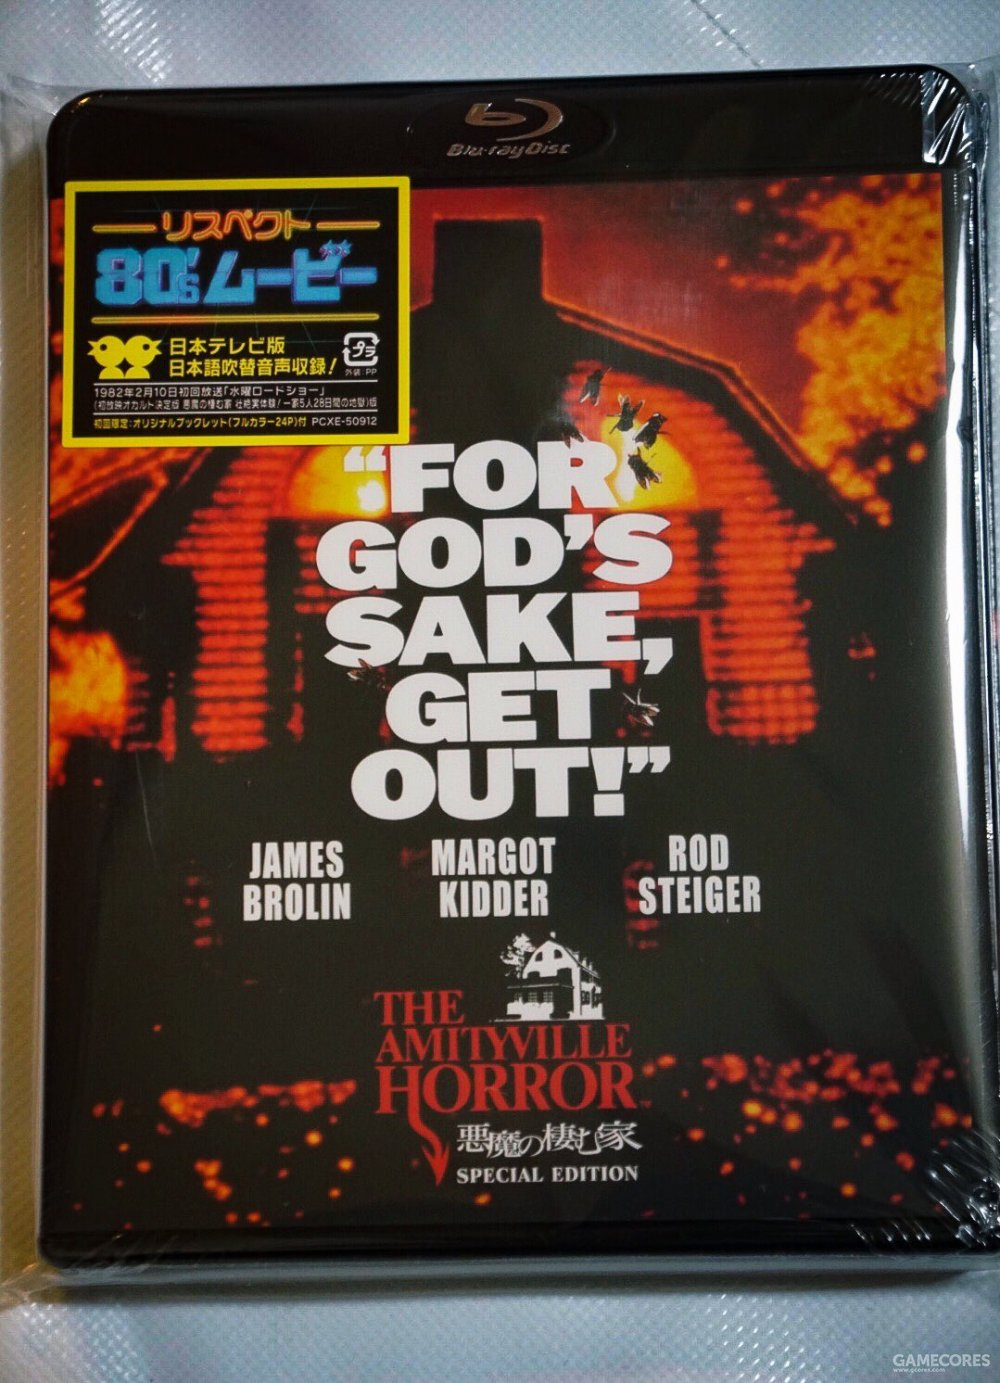 1.《鬼哭神嚎》(The Amityville Horror)(1979)